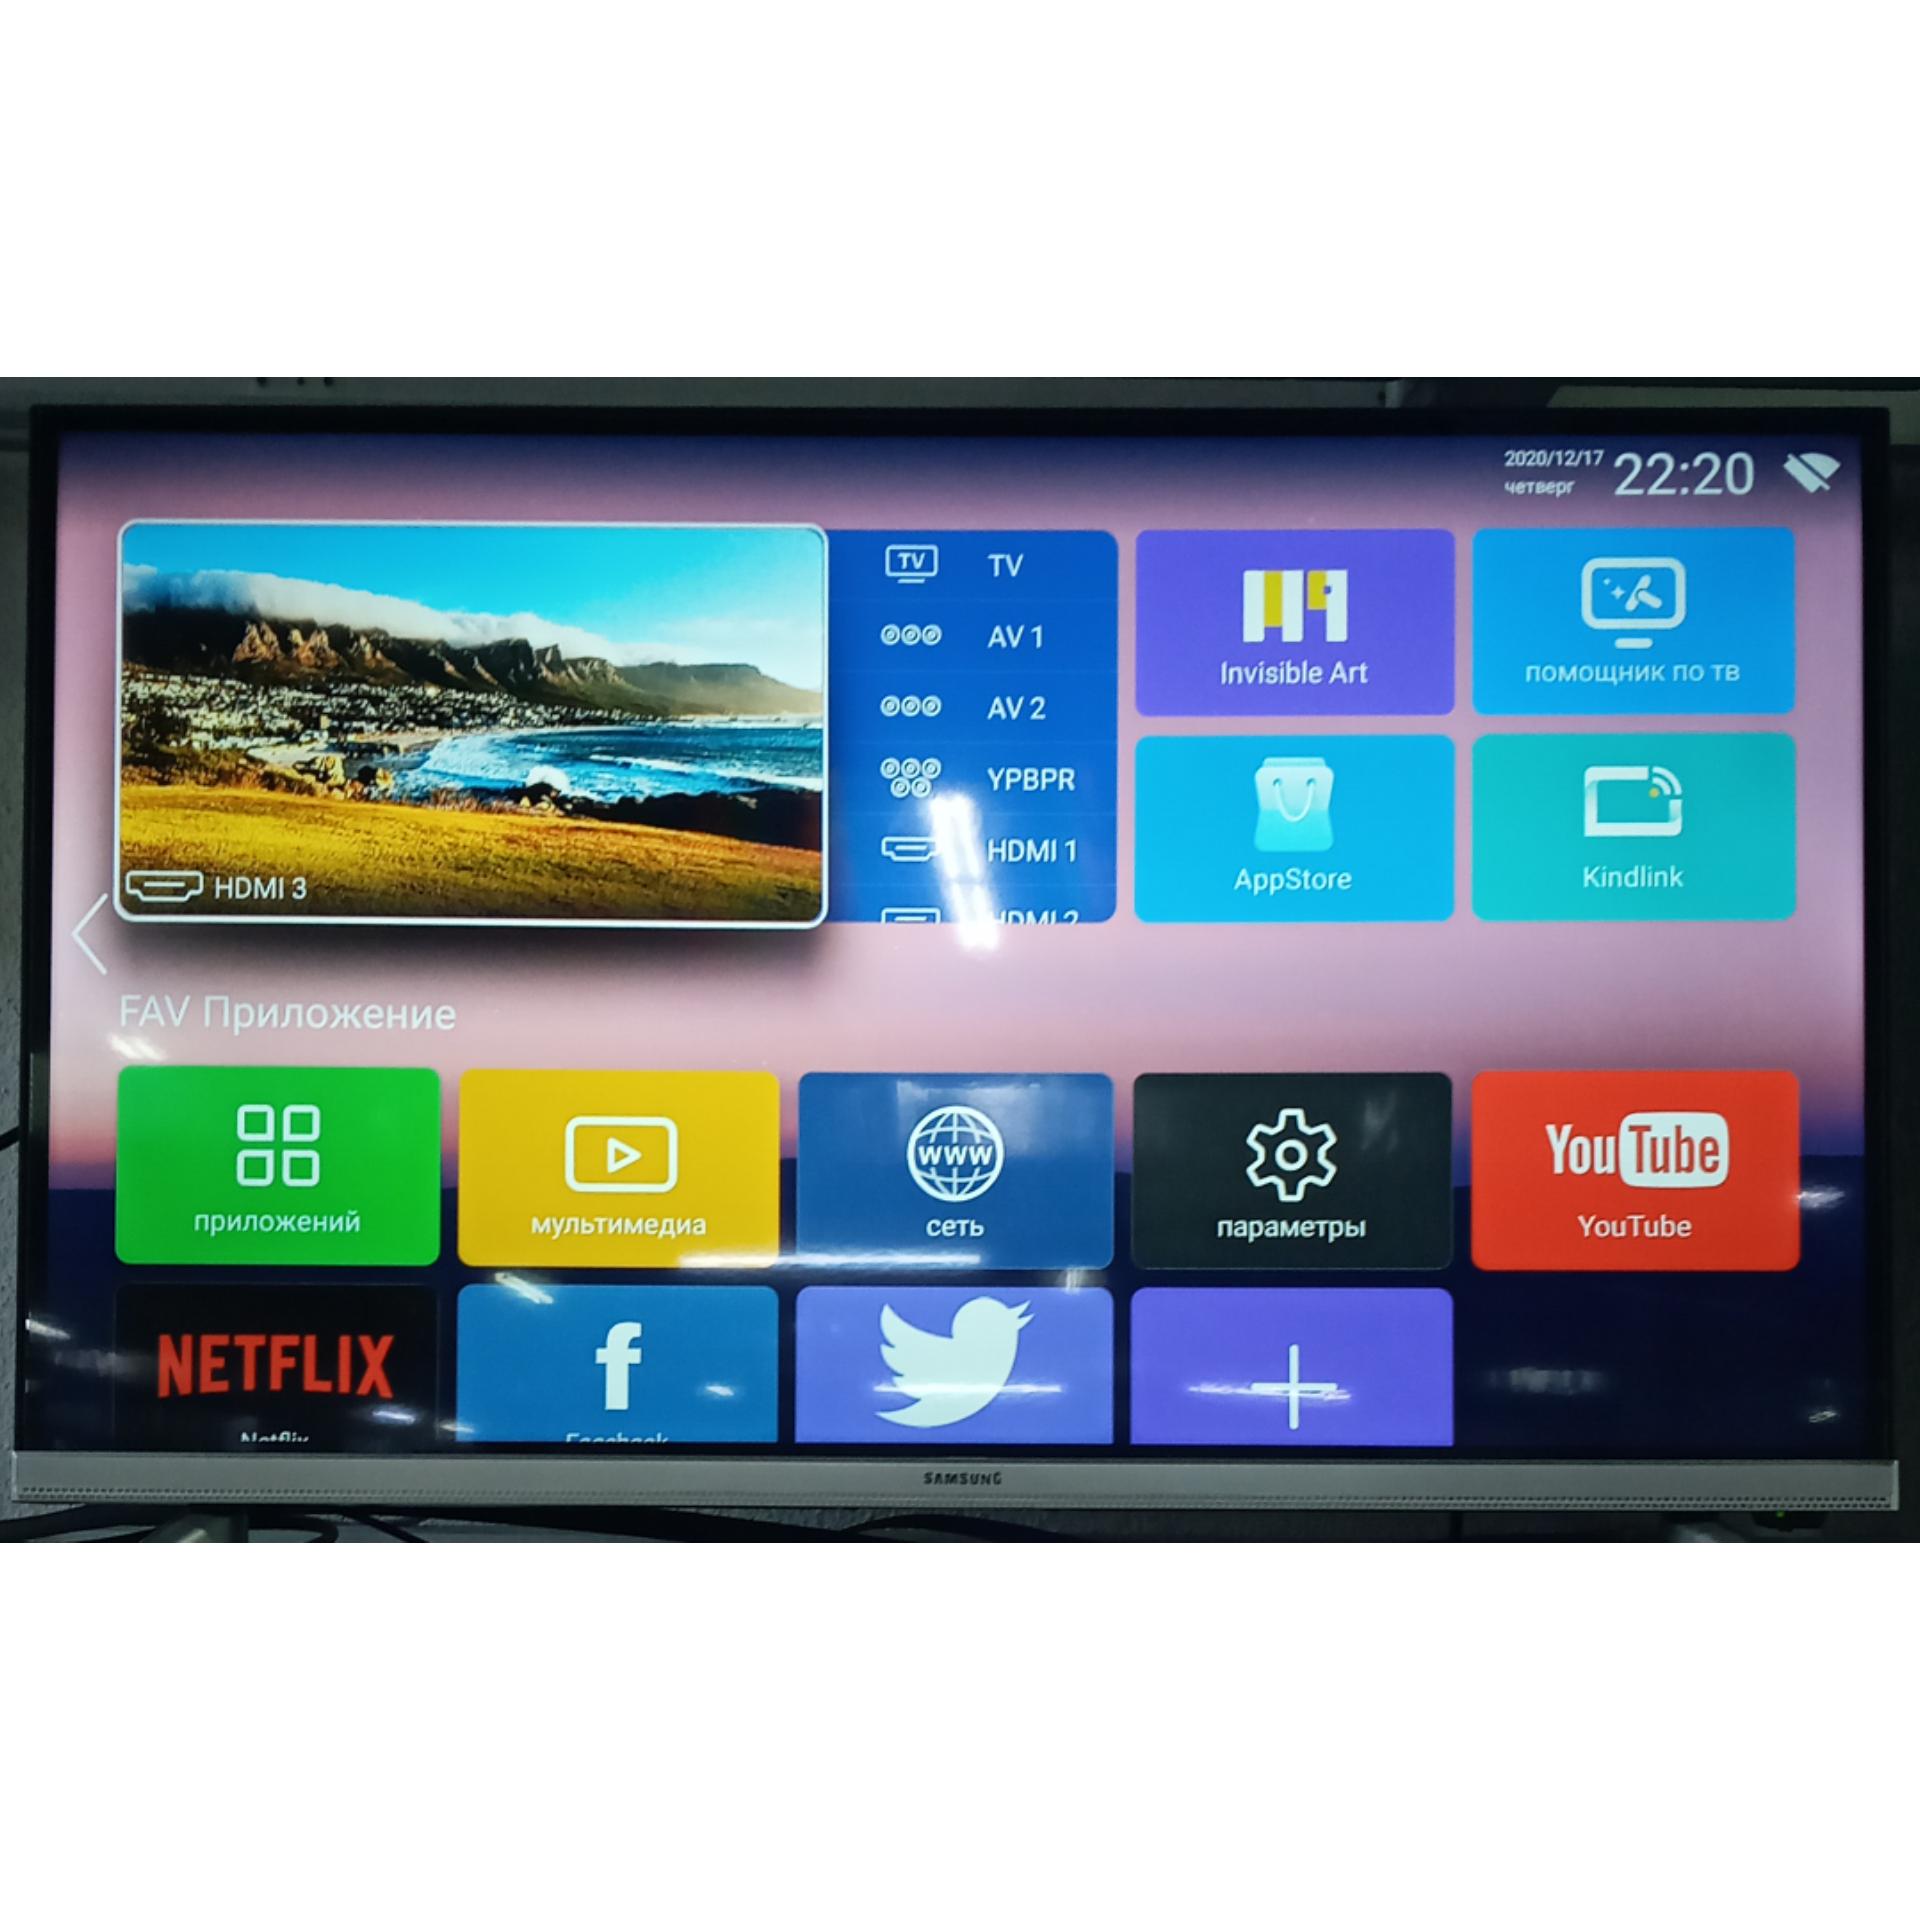 Телевизор Samsung FullHD 81 cм